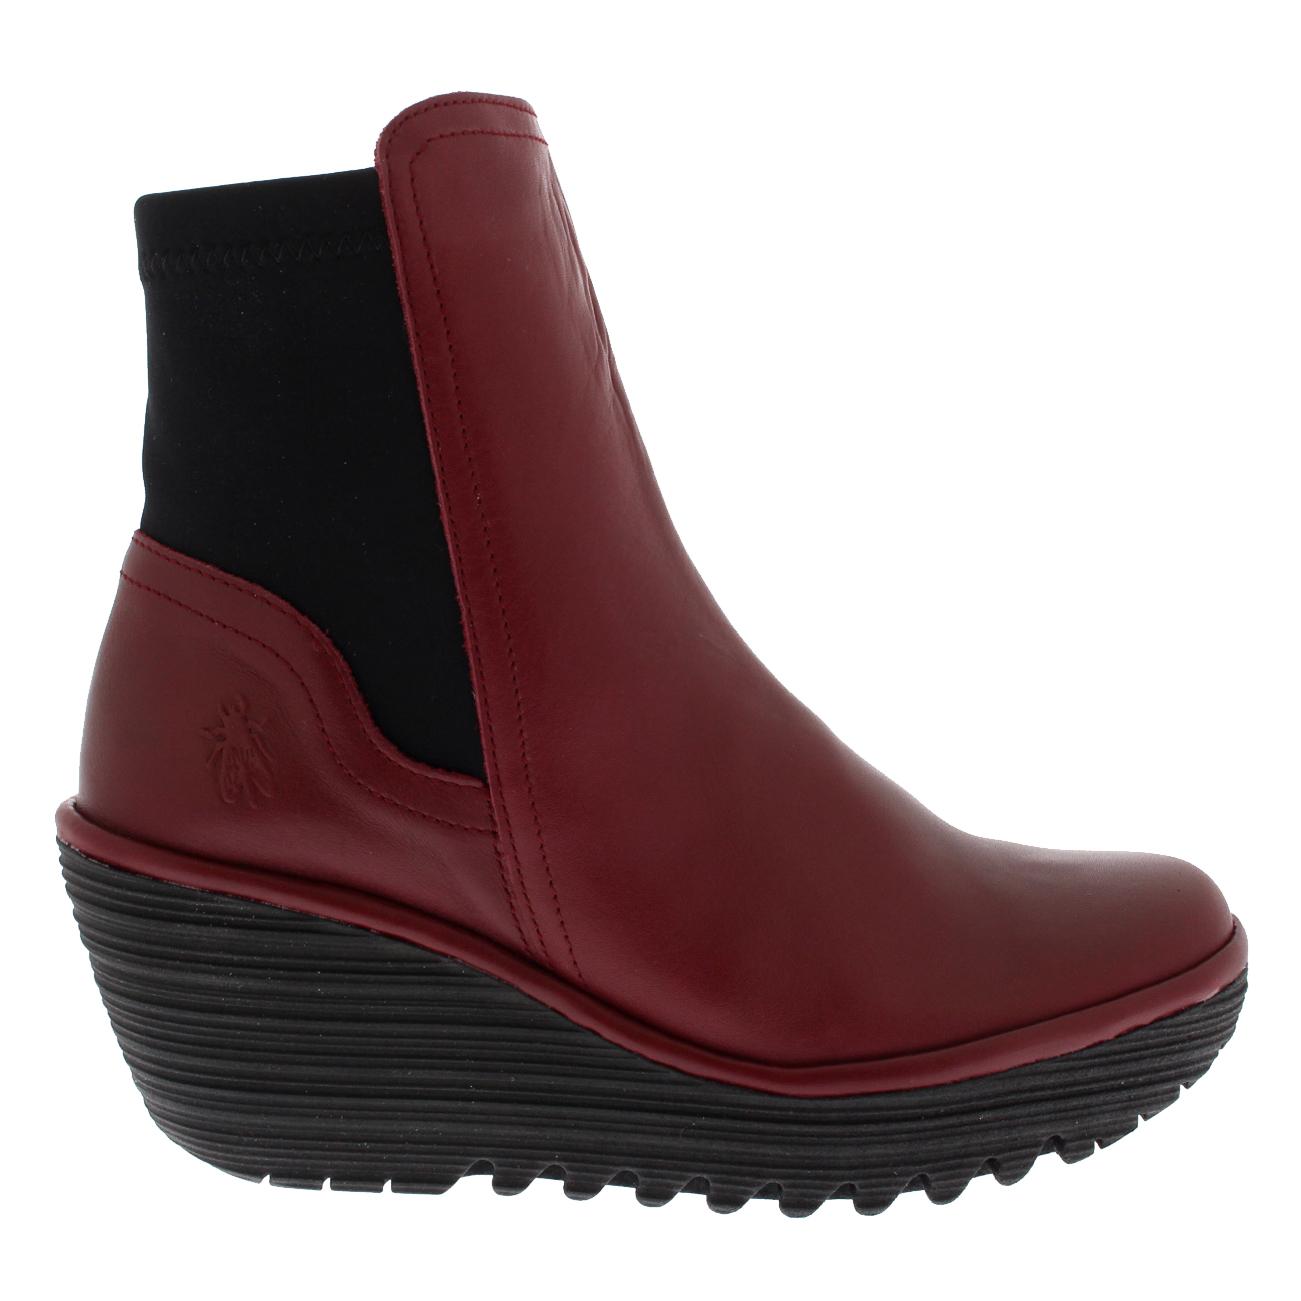 damen damen damen Fly London Yuan Casual Winter Wedges Fashion Leather Ankle Stiefel US 5-11 c89a46